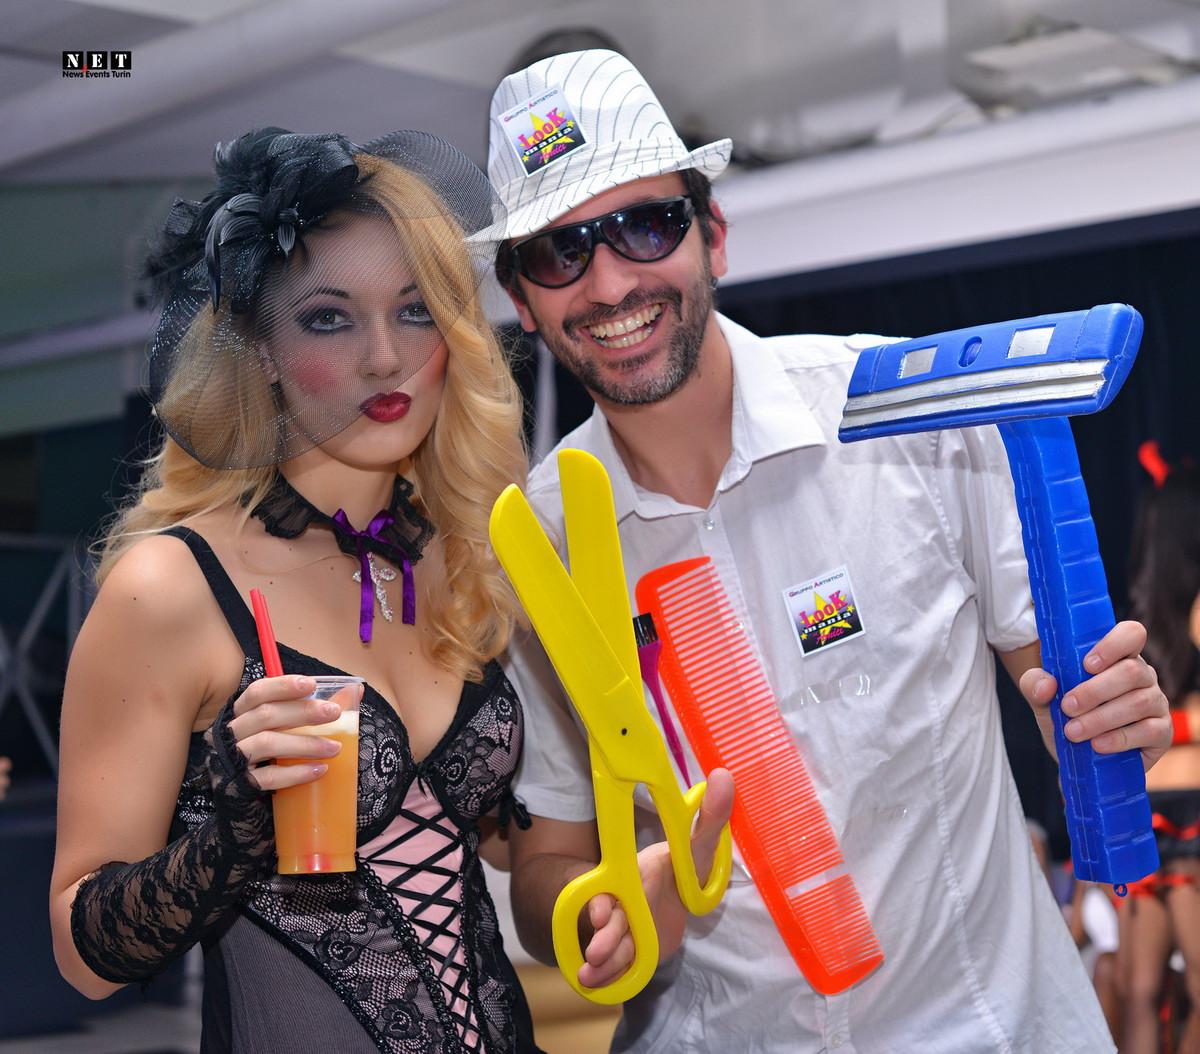 День Любви в Турине карнавал фото и видео. Carnival Fashion Party и San Valentino